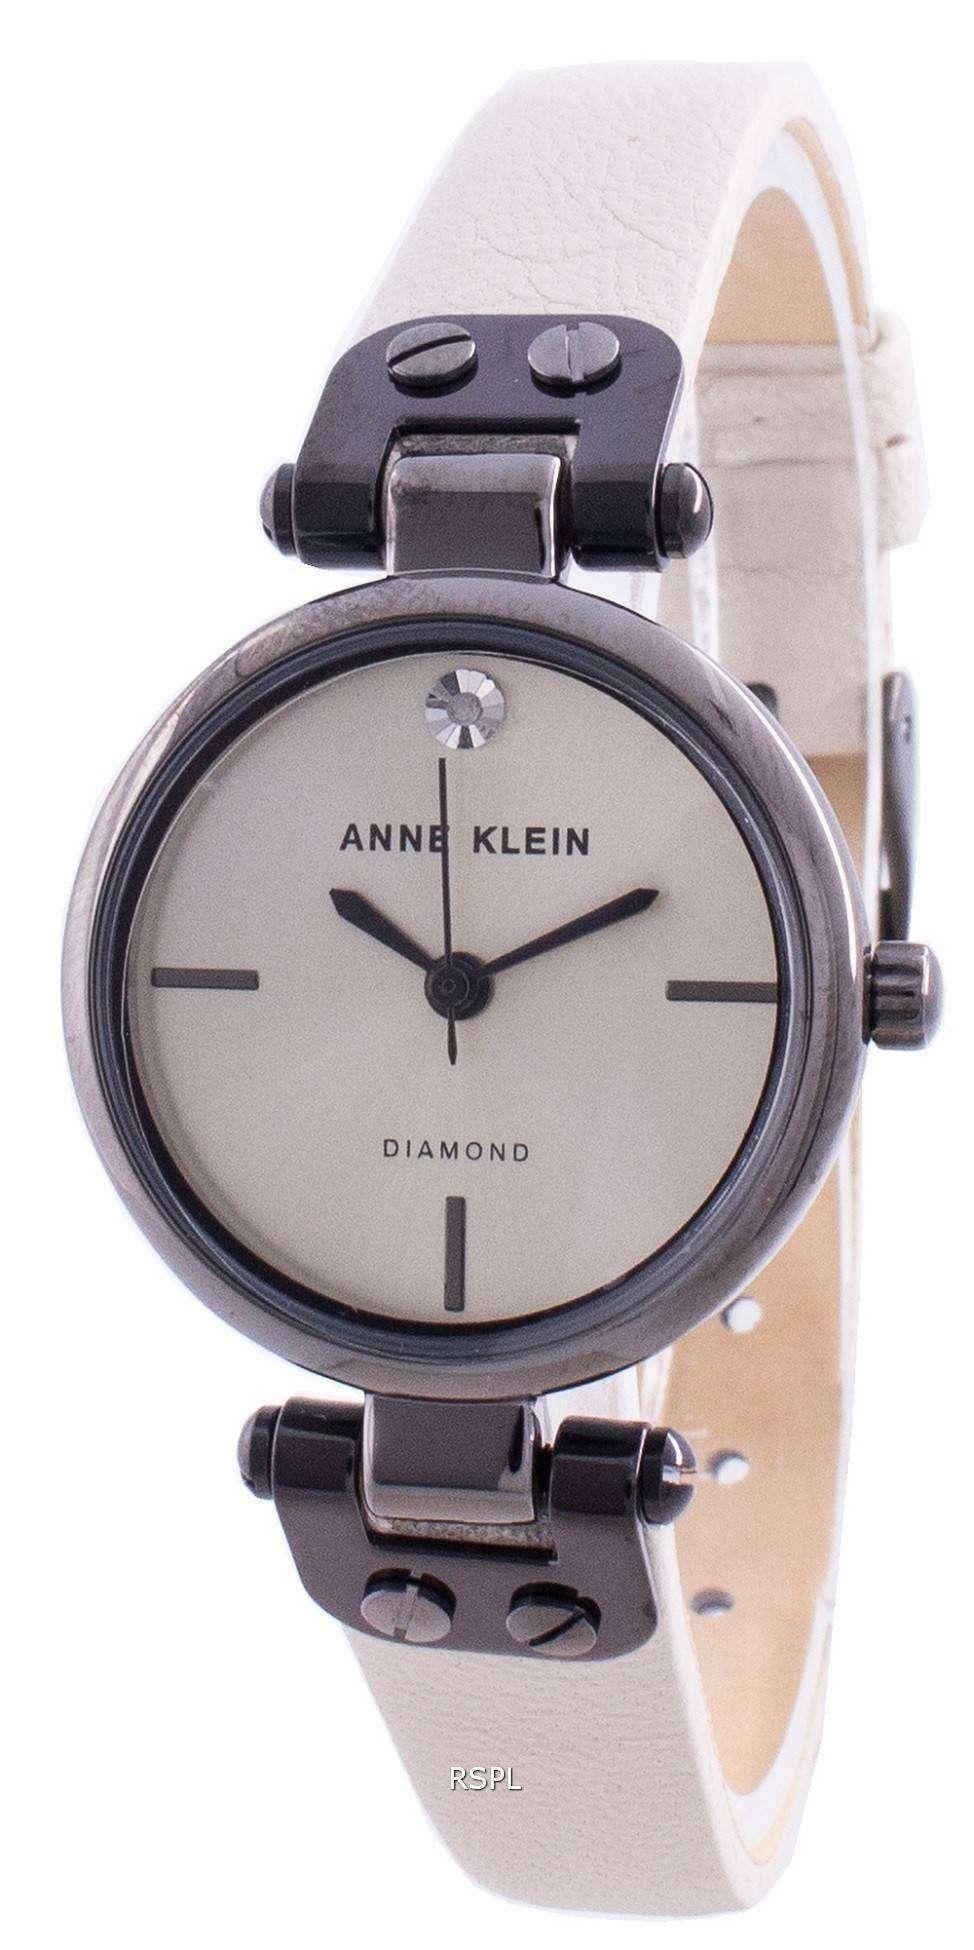 Anne Klein Genuine Diamond 3513GYCR Quartz Women's Watch